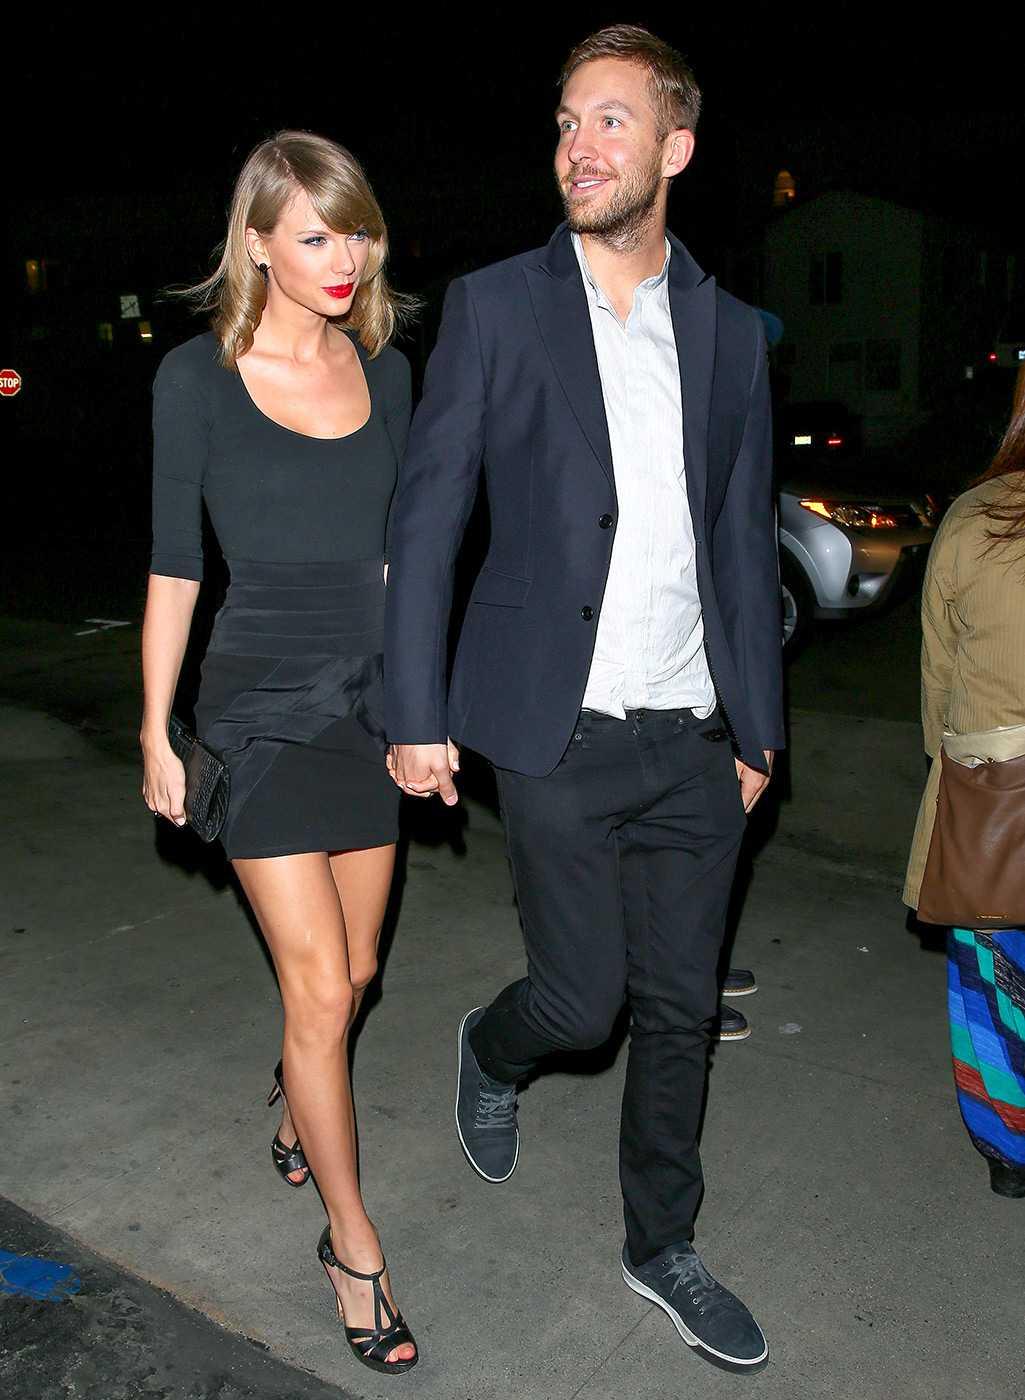 Calvin Harris Spars With Zayn Malik On Twitter Defending T-Swift's Honor | Twitter